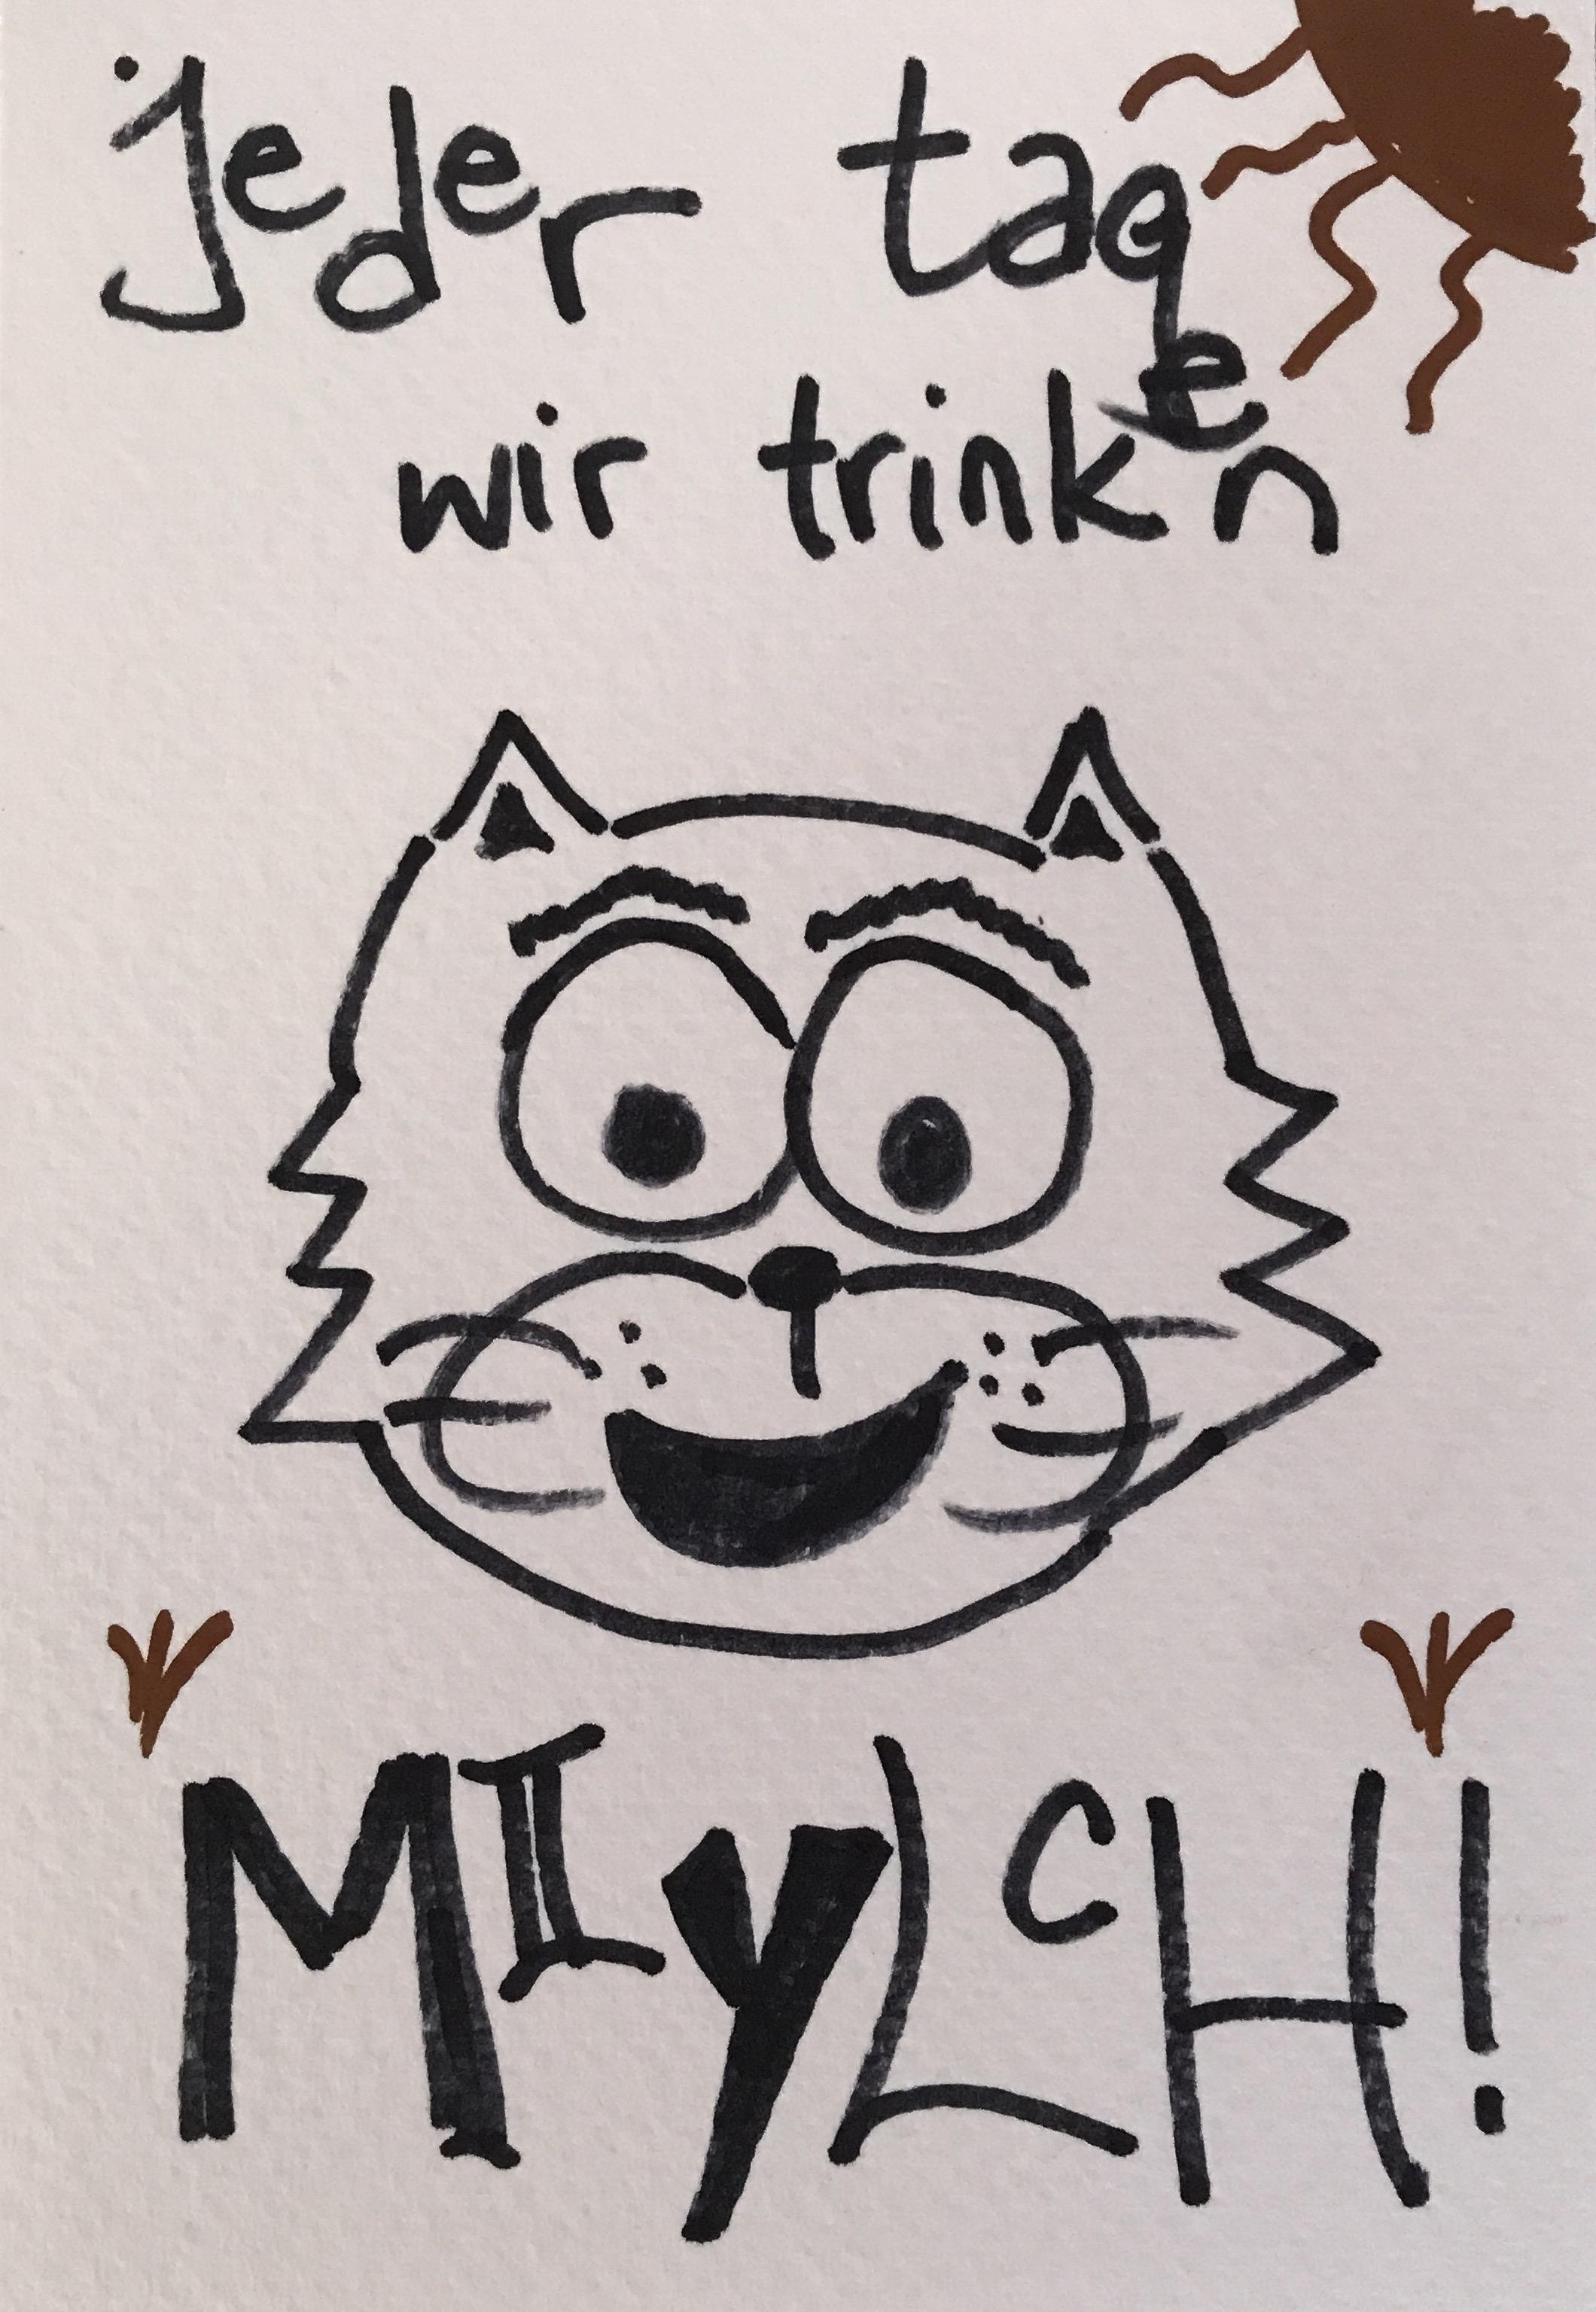 Jeden Tag trinken wir miylch かわいい ドイツ語 仔猫 描く コミックス comics kitten kätzchen drawing ink